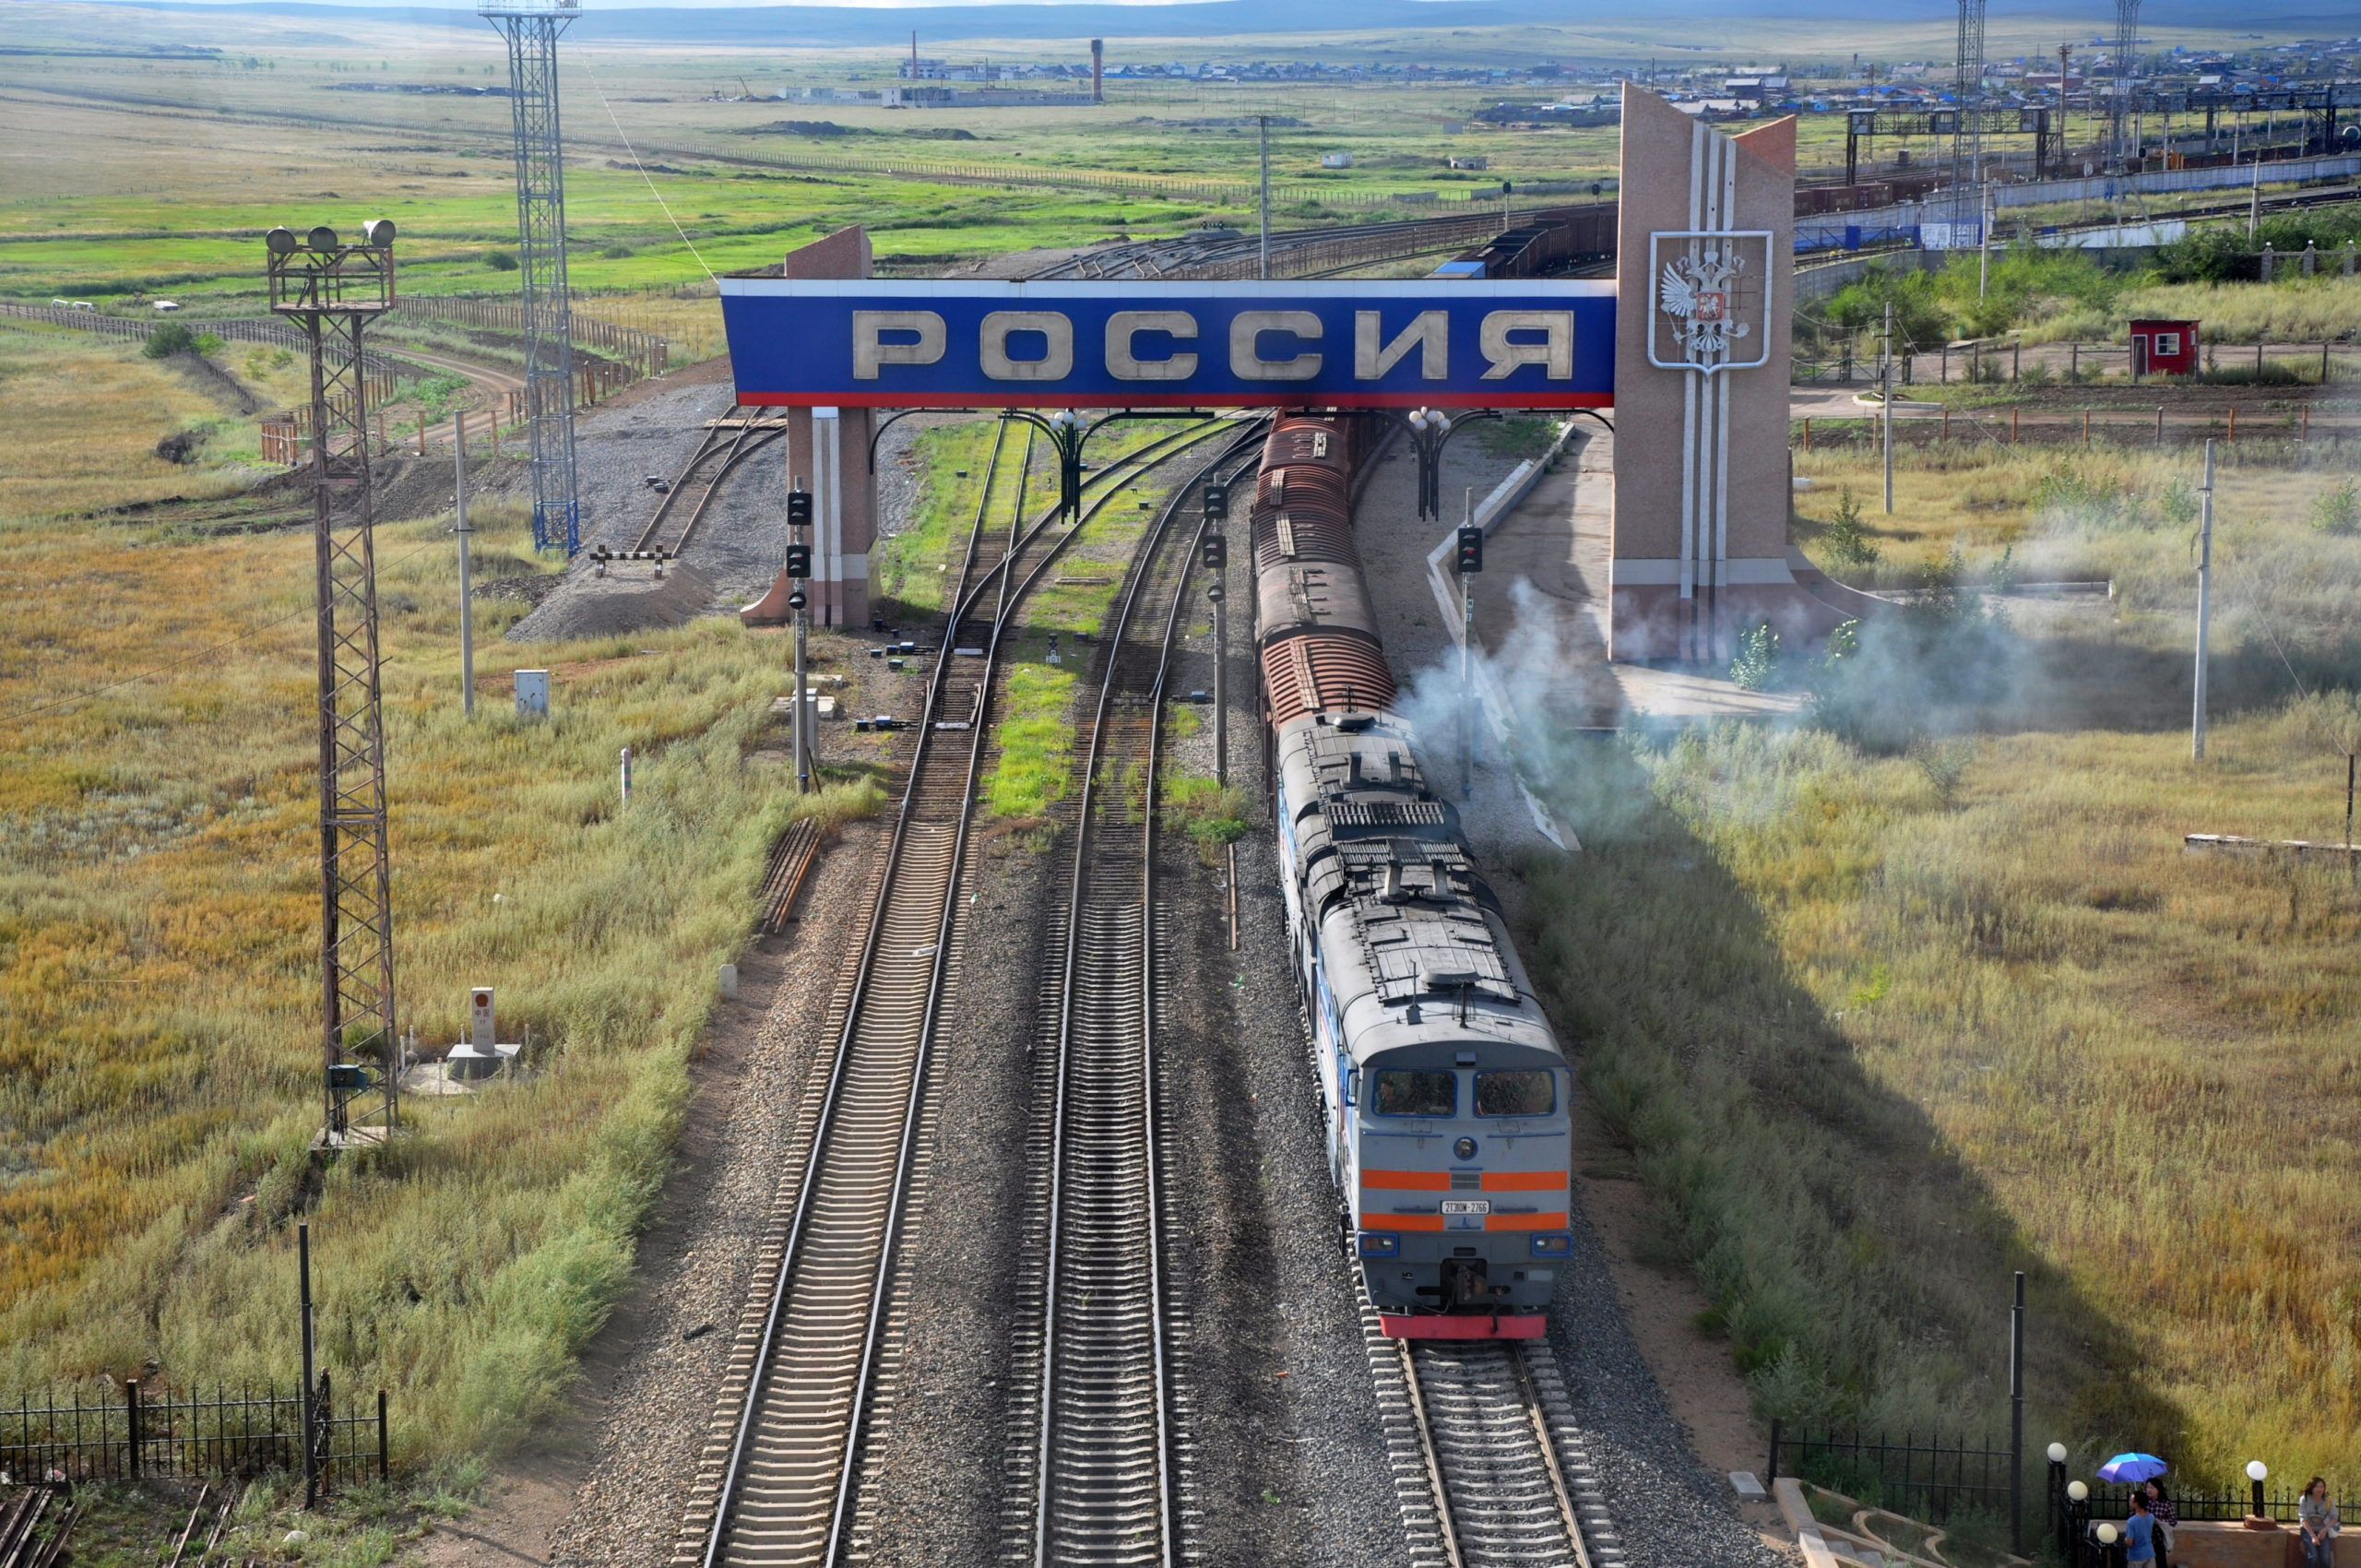 The Zabaykalsk border crossing